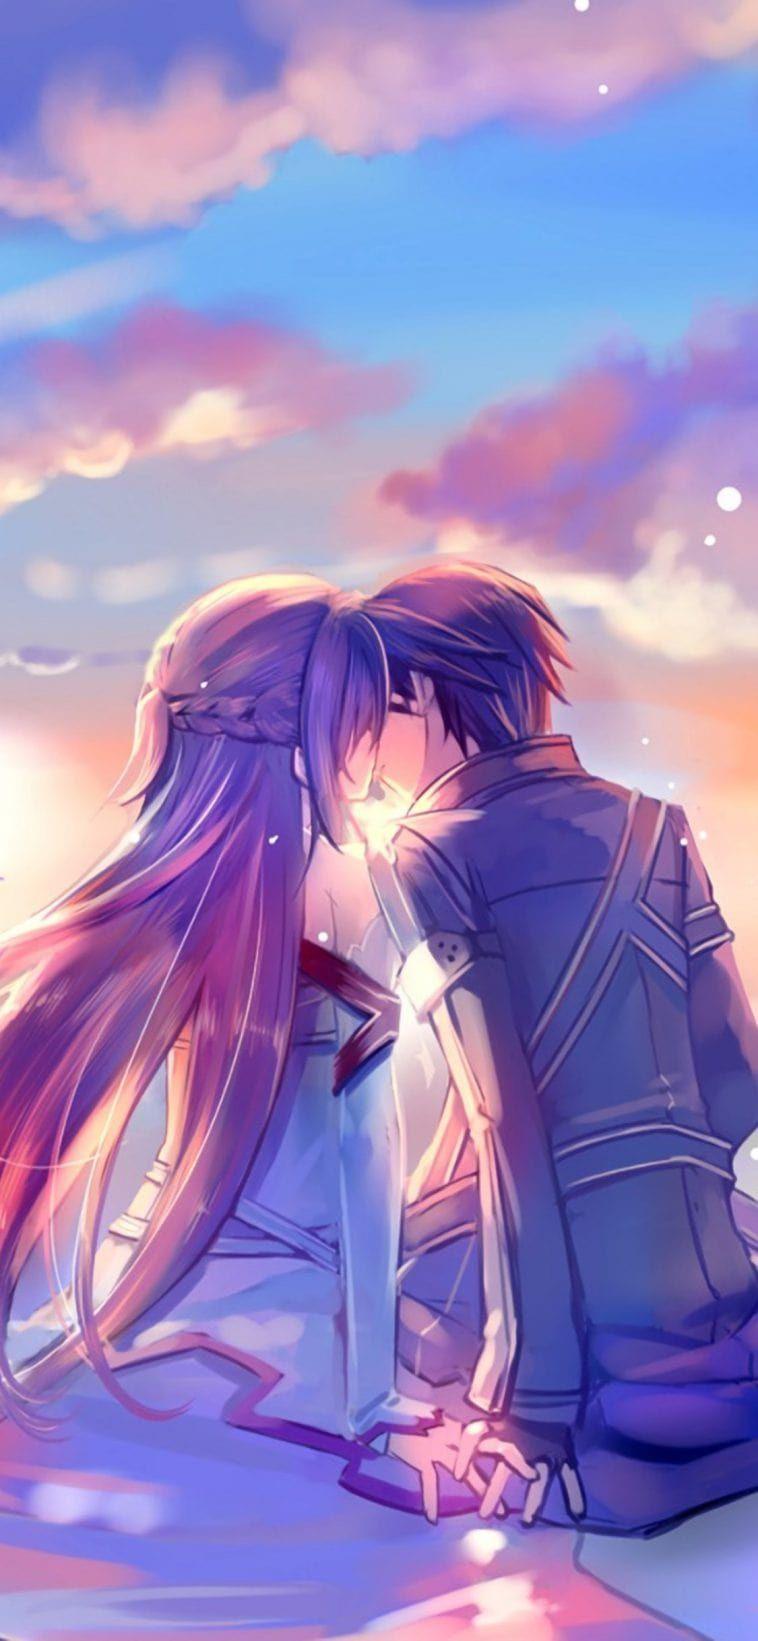 Iphone 11 Wallpaper Anime Couple 4k Hd Download Free Sword Art Online Wallpaper Anime Wallpaper Sword Art Online